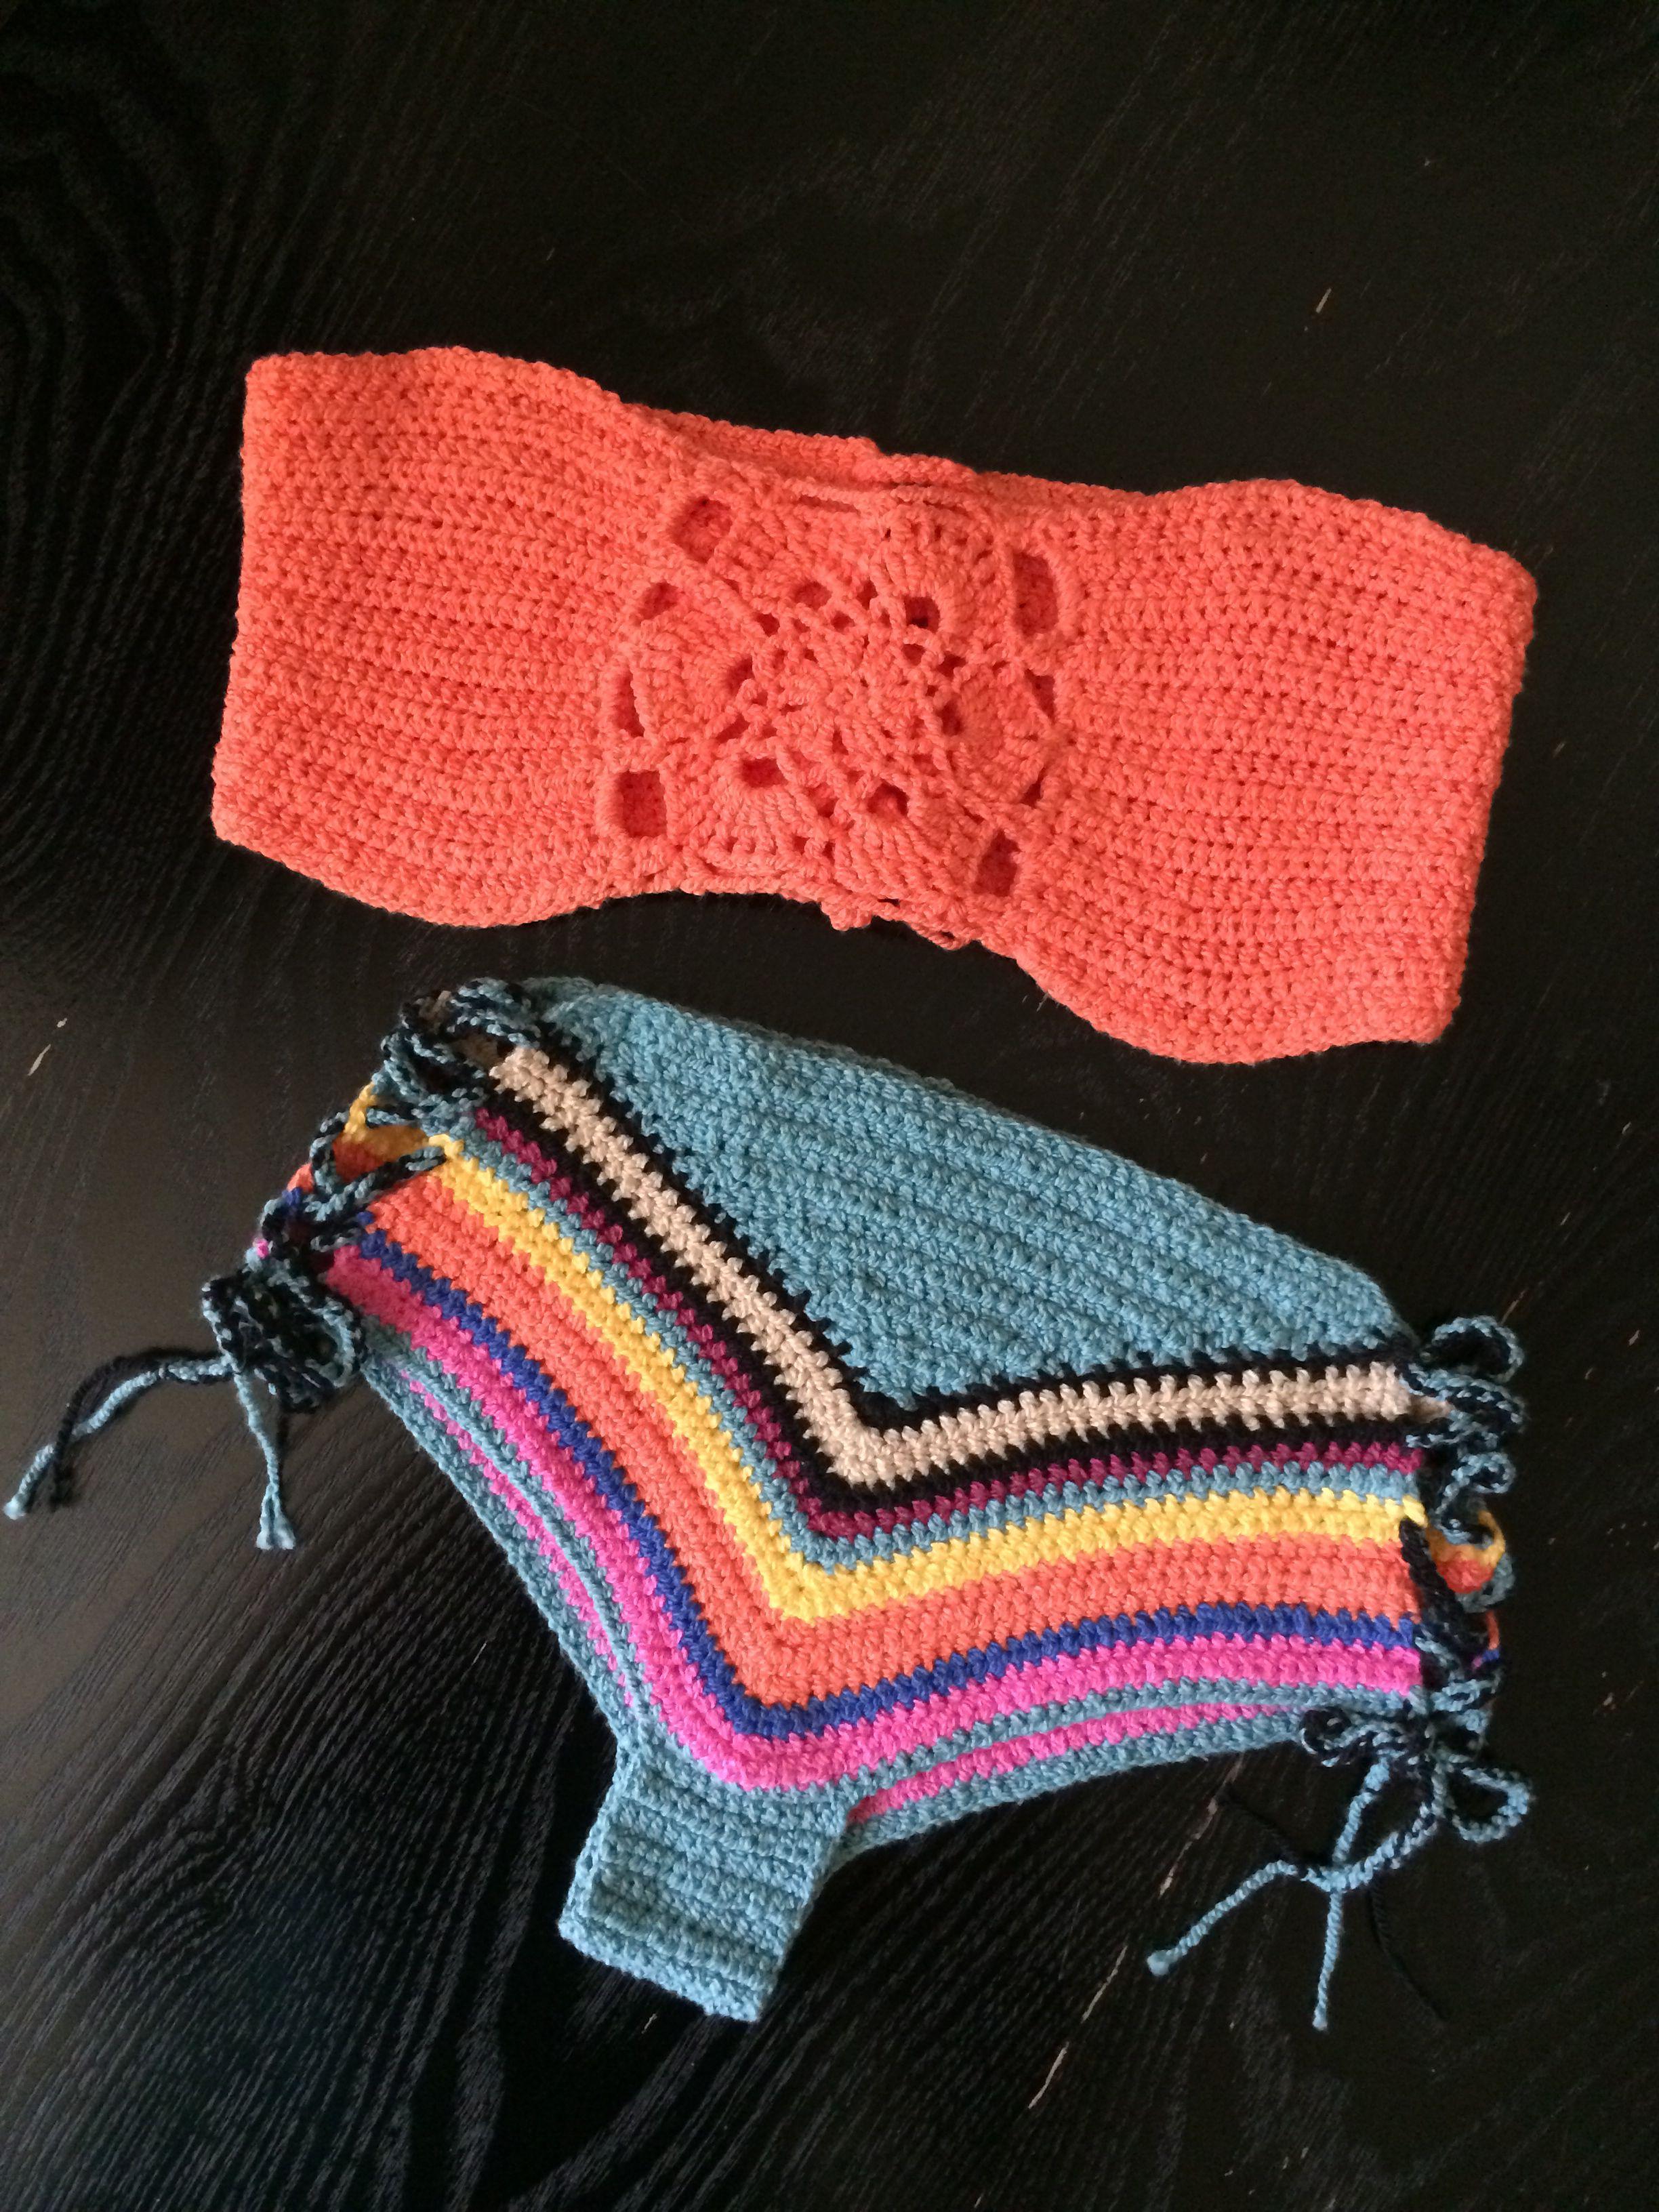 ️Star Coral Bandeau + CrissCross Tribal bottom is so bright and sunny! #bandeau #tubetop #bikini #crochetbikini #crochettop #madetoorder #handmade #worldwidedelivery #dubai #hippie #boho